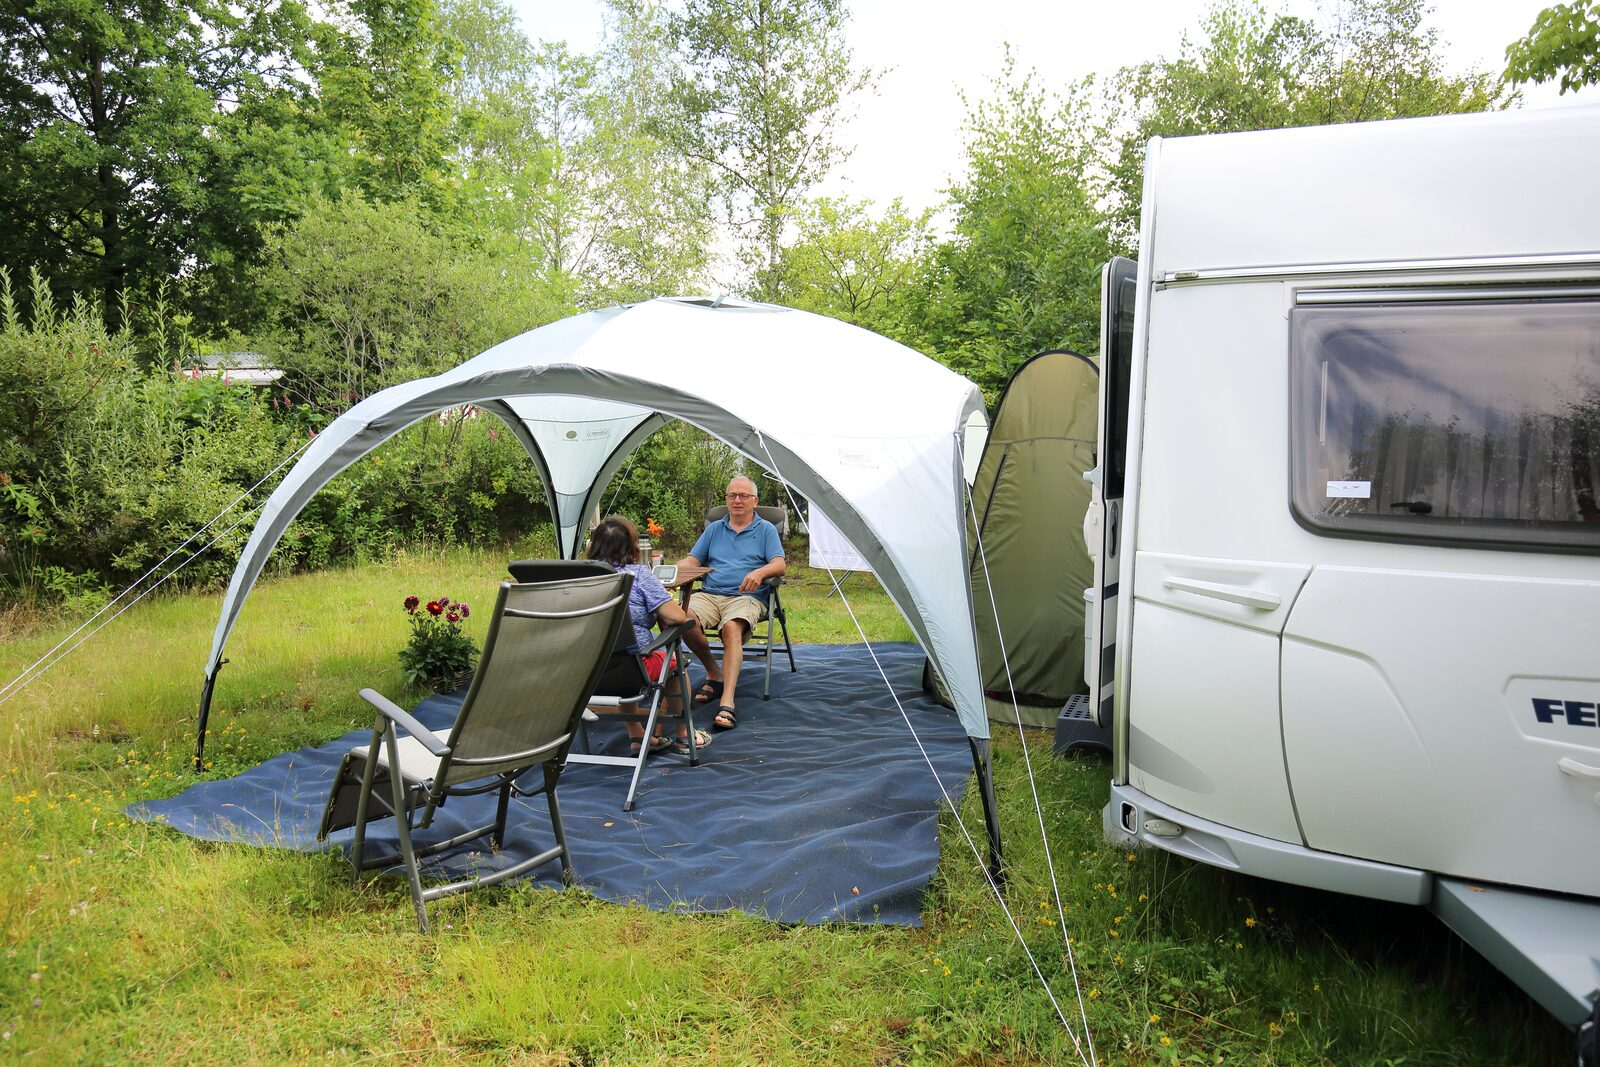 Goedkope camping in Belgie